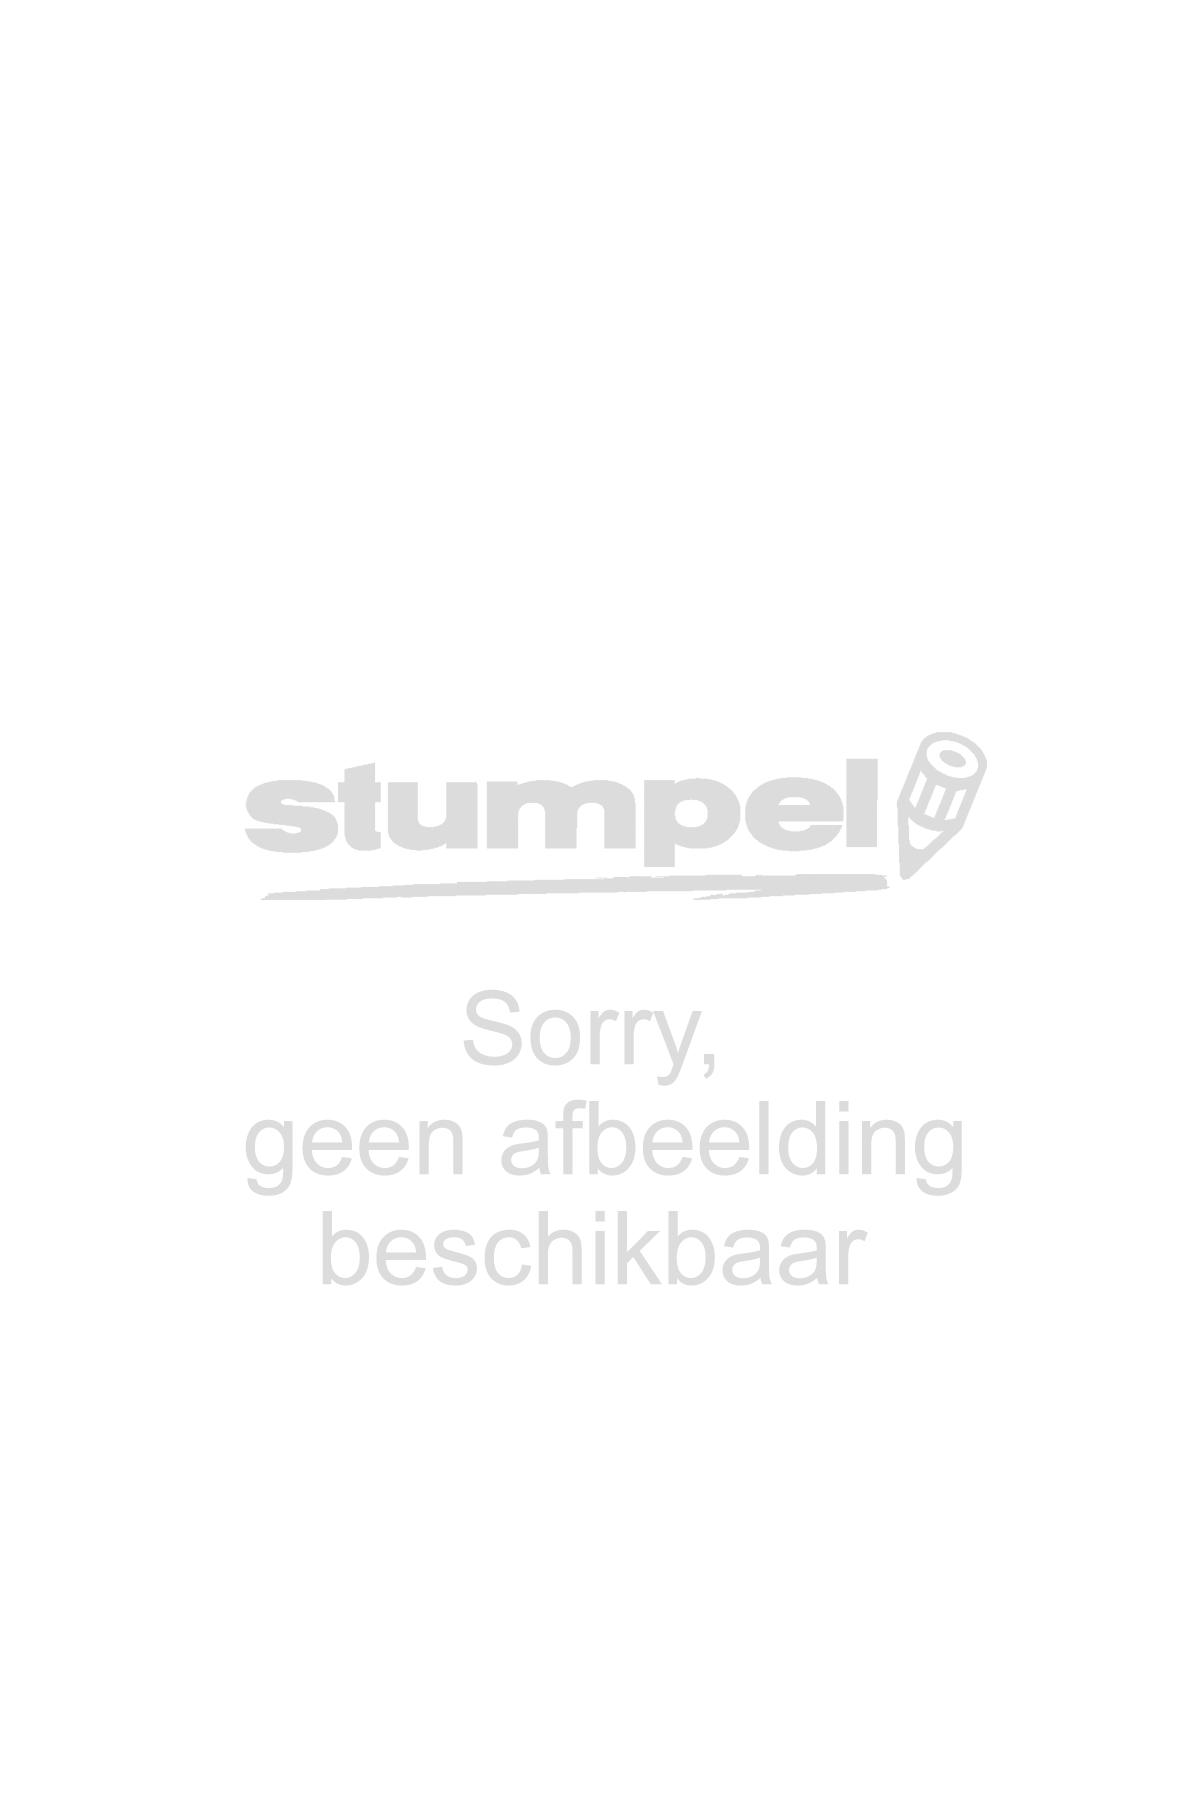 agenda-2021-ryam-efficiency-kort-1-dag-nl-blauw-11010919